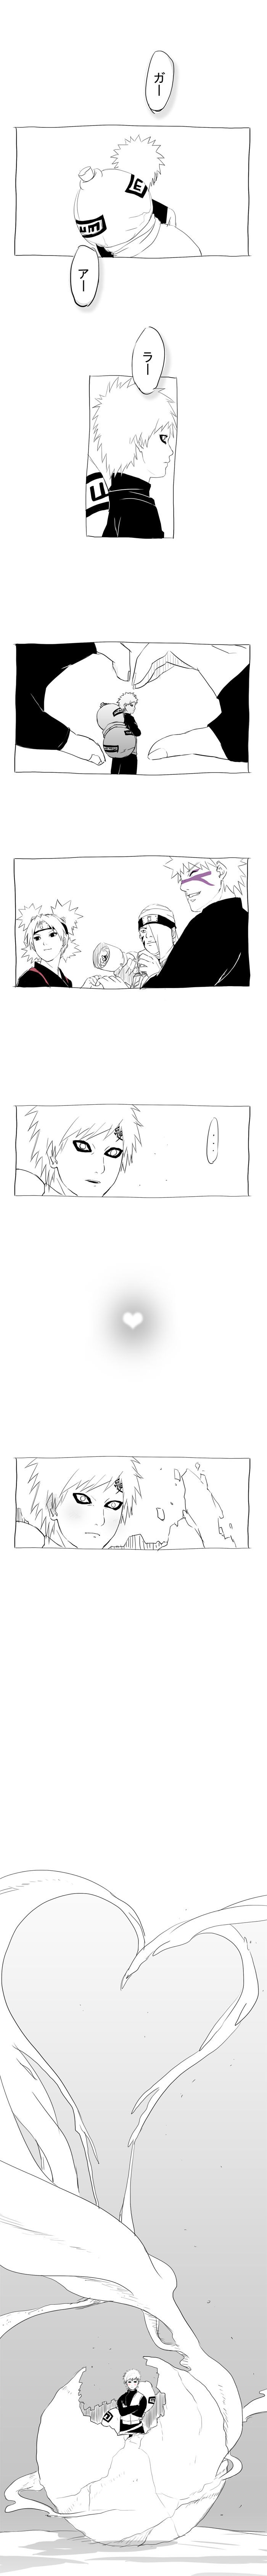 Gaara, Temari, Kankuro and Baki, Naruto Shippuden i think this is so adorable... love can break Gara's ultimate defense<3